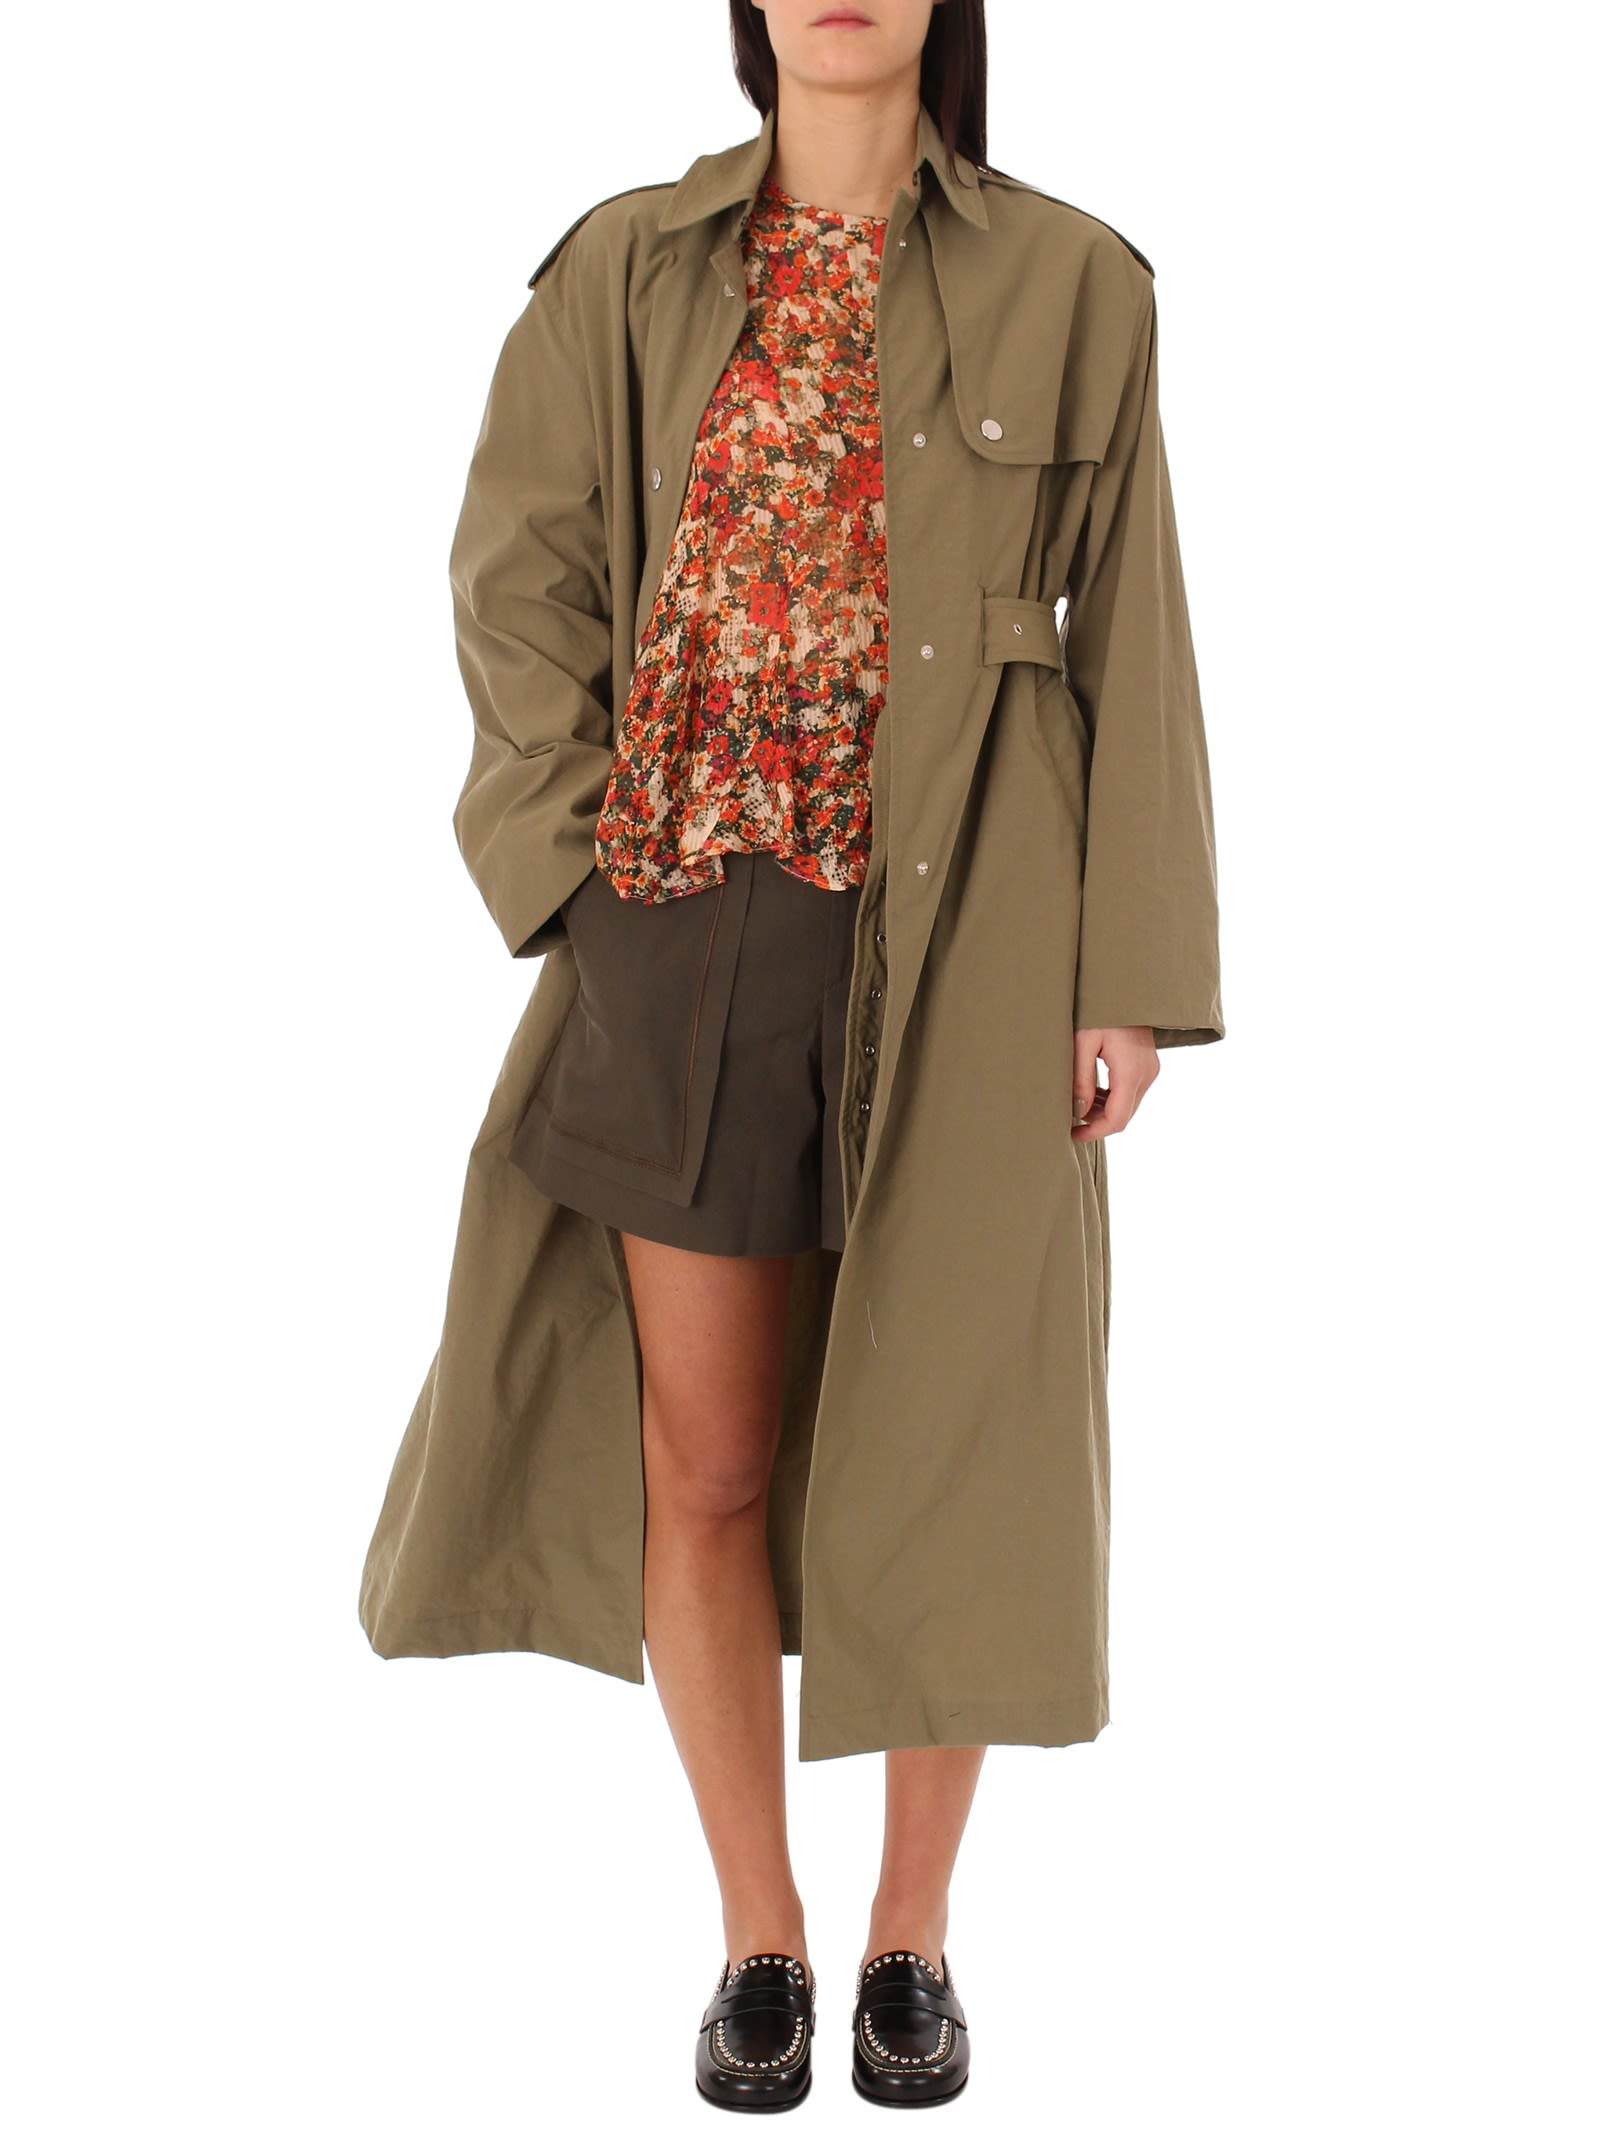 Isabel Marant - Isabel Marant Lawney Khaki Trench Coat - Green, Women's Coats & Jackets | Italist